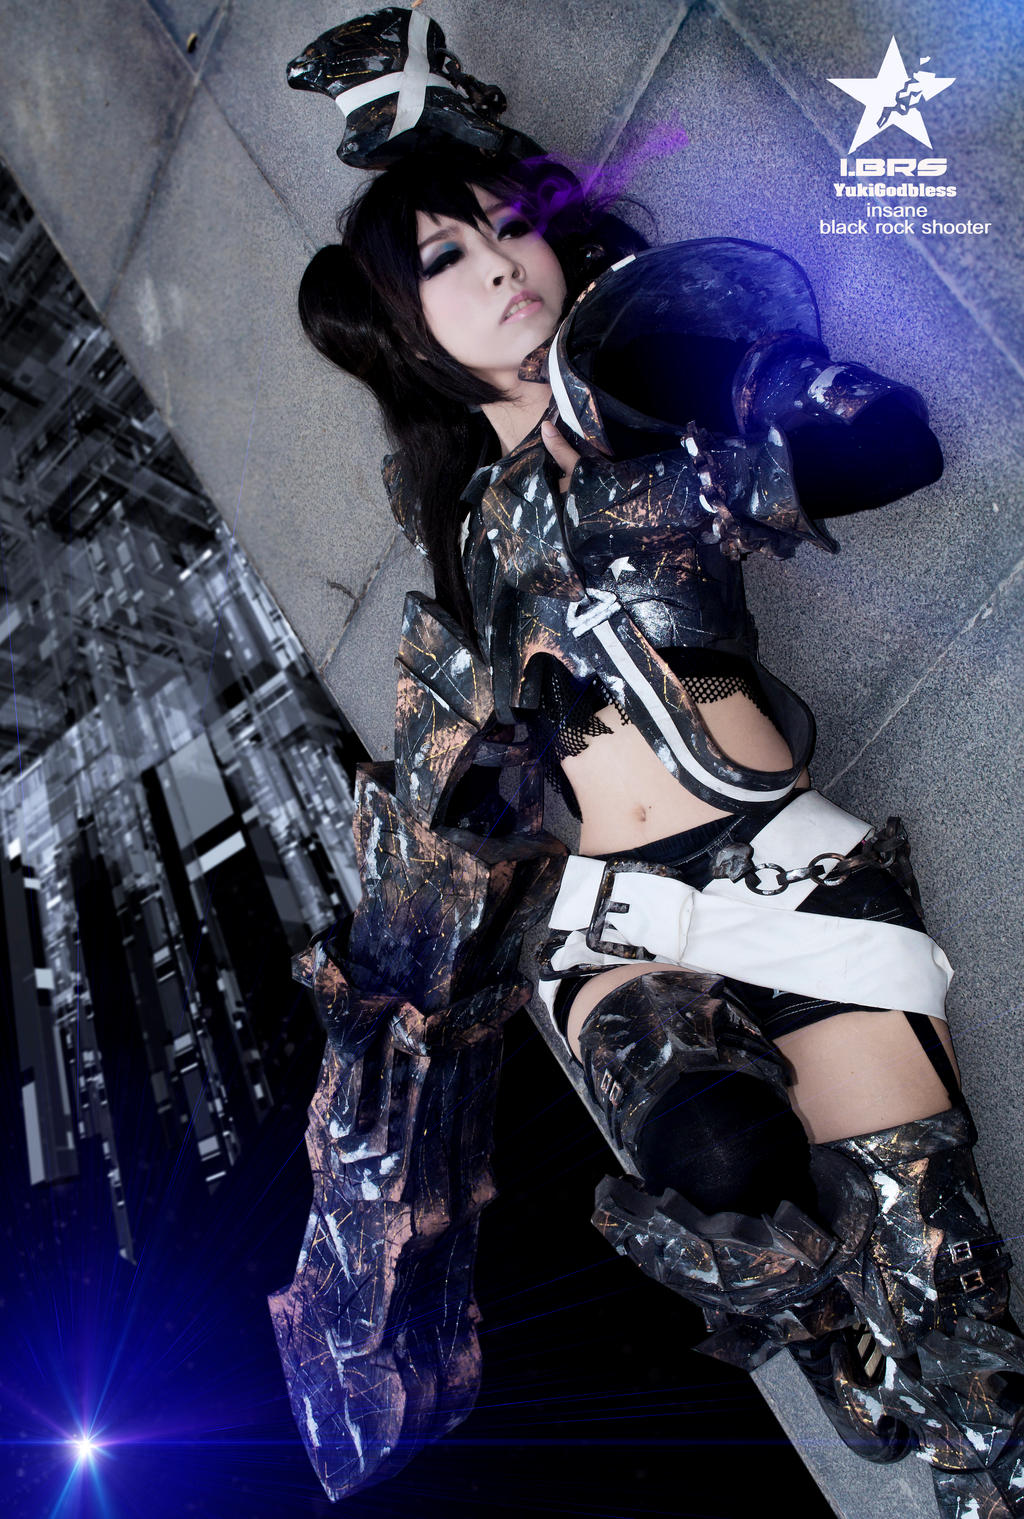 Insane Black Rock Shooter by yukigodbless on DeviantArt